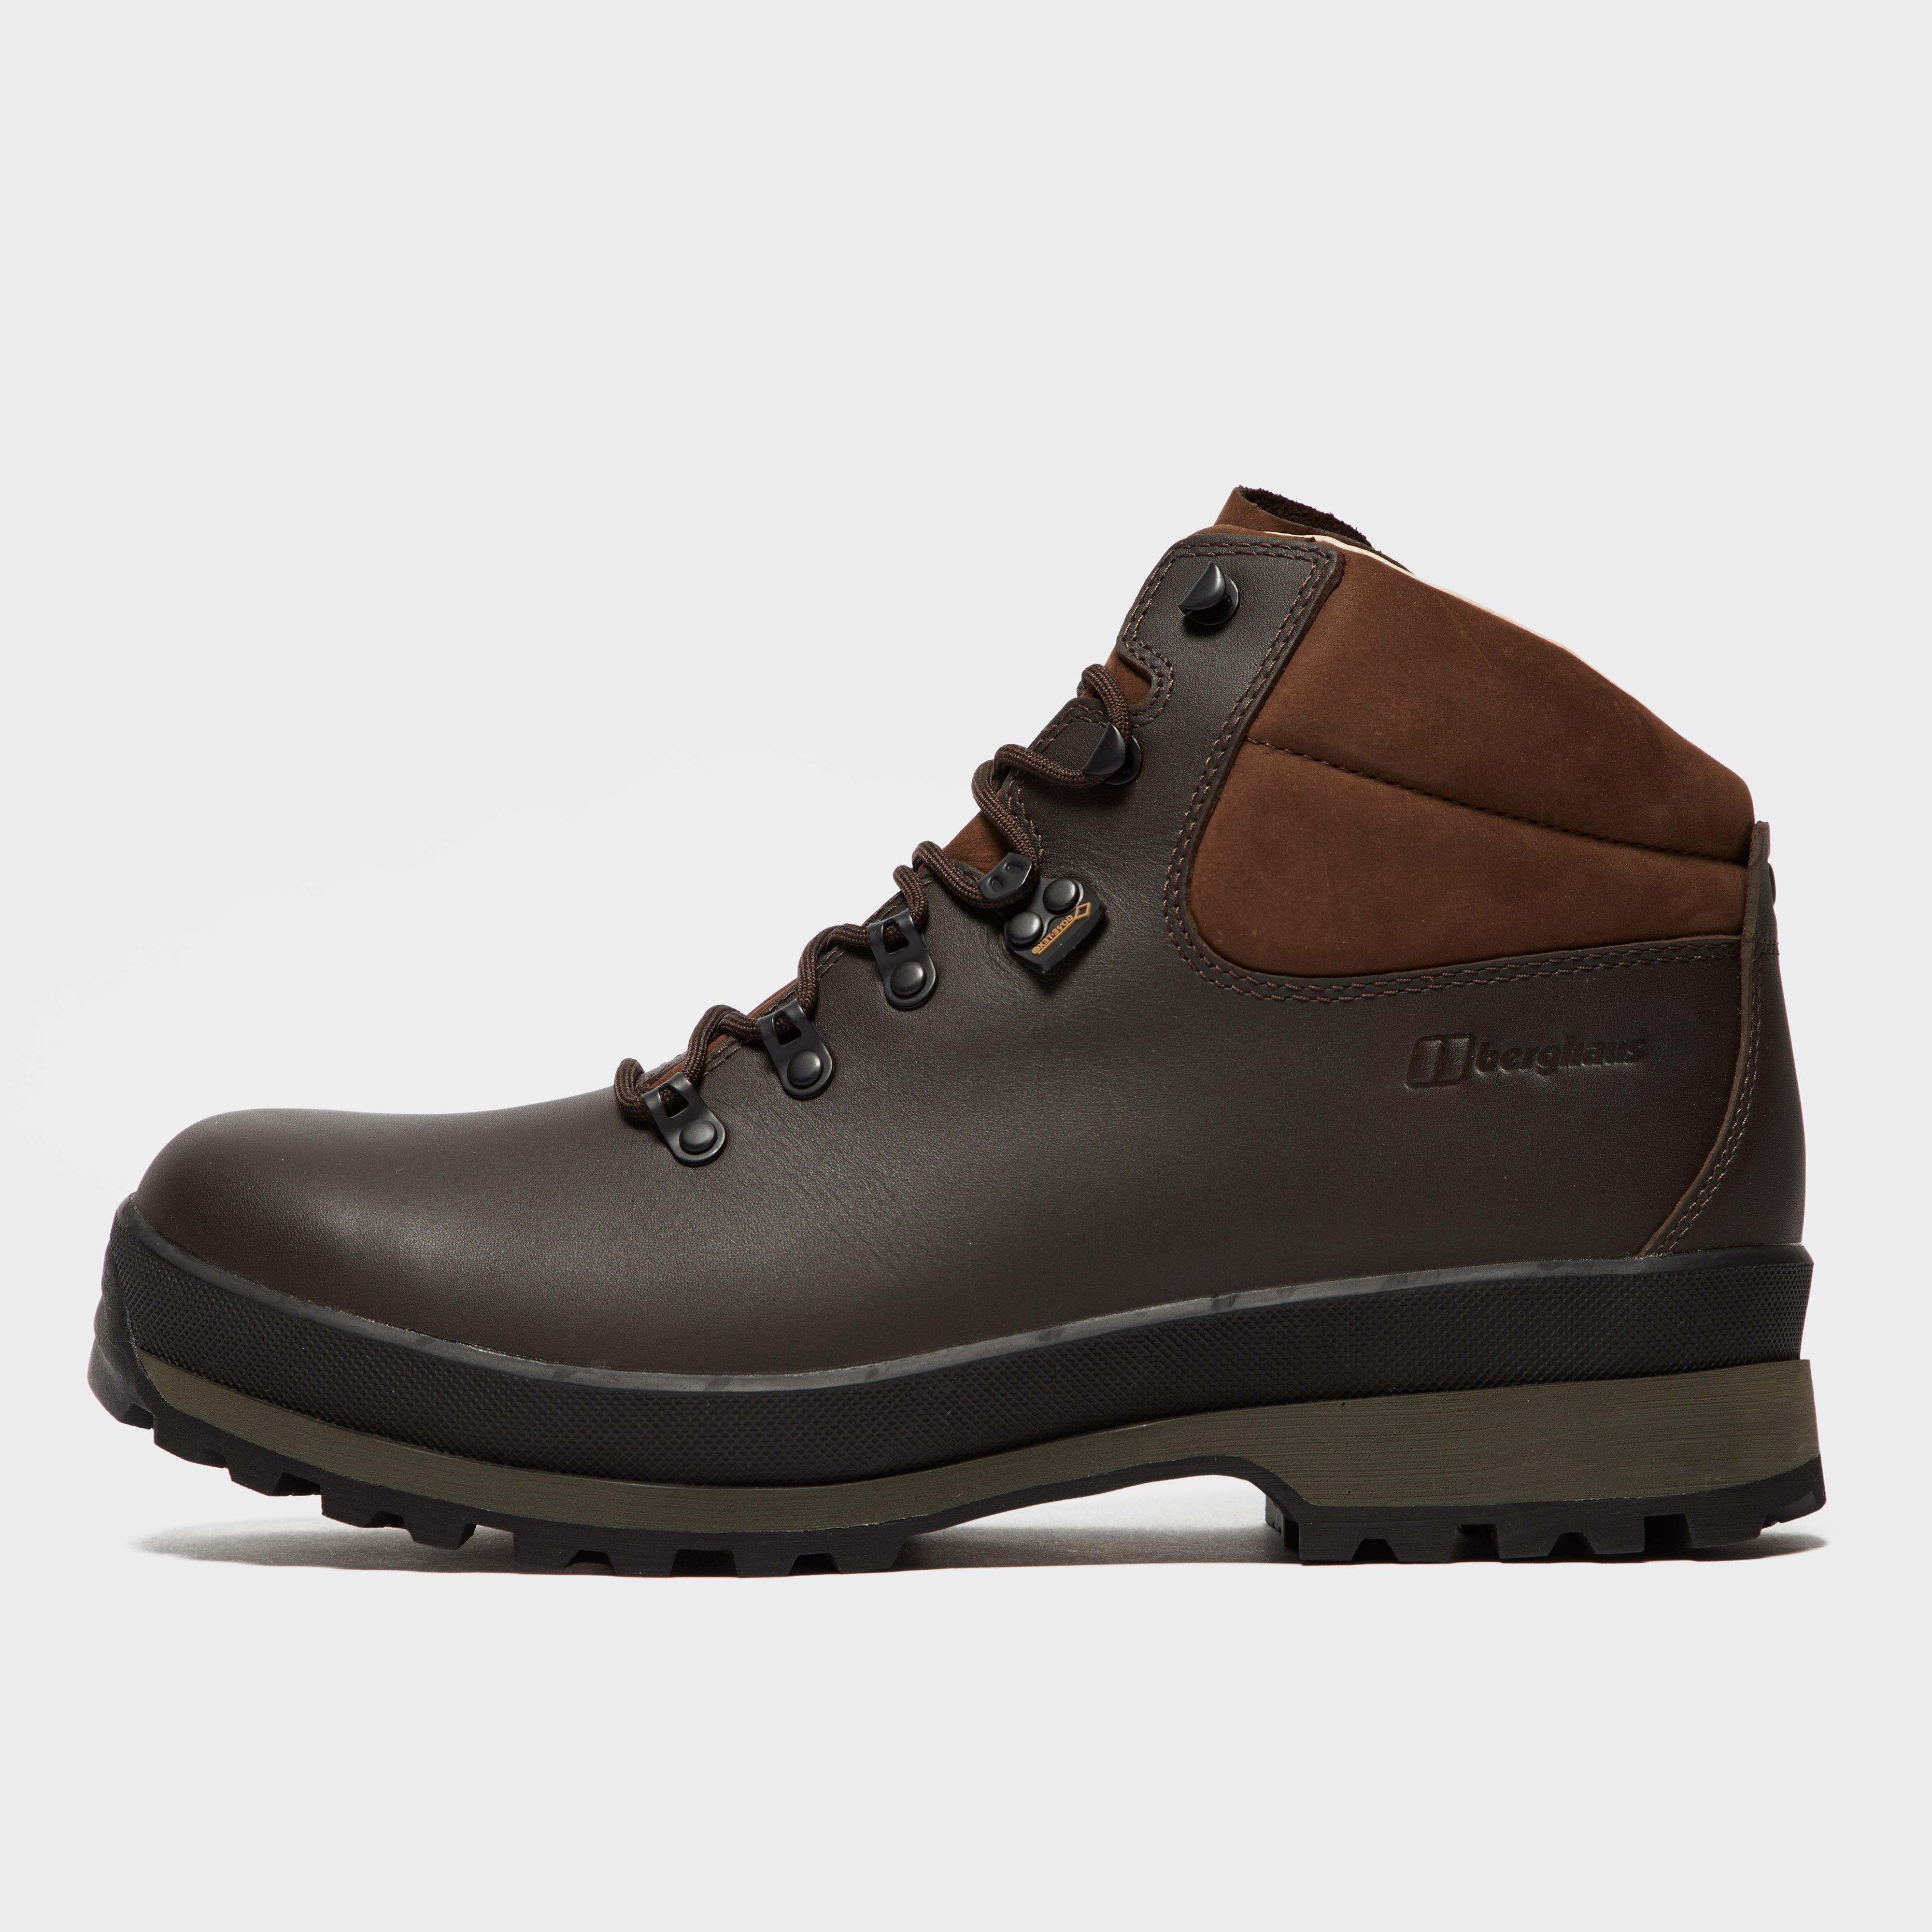 Berghaus Hillmaster Ii Gore-Tex Walking Boot - Brown, Brown